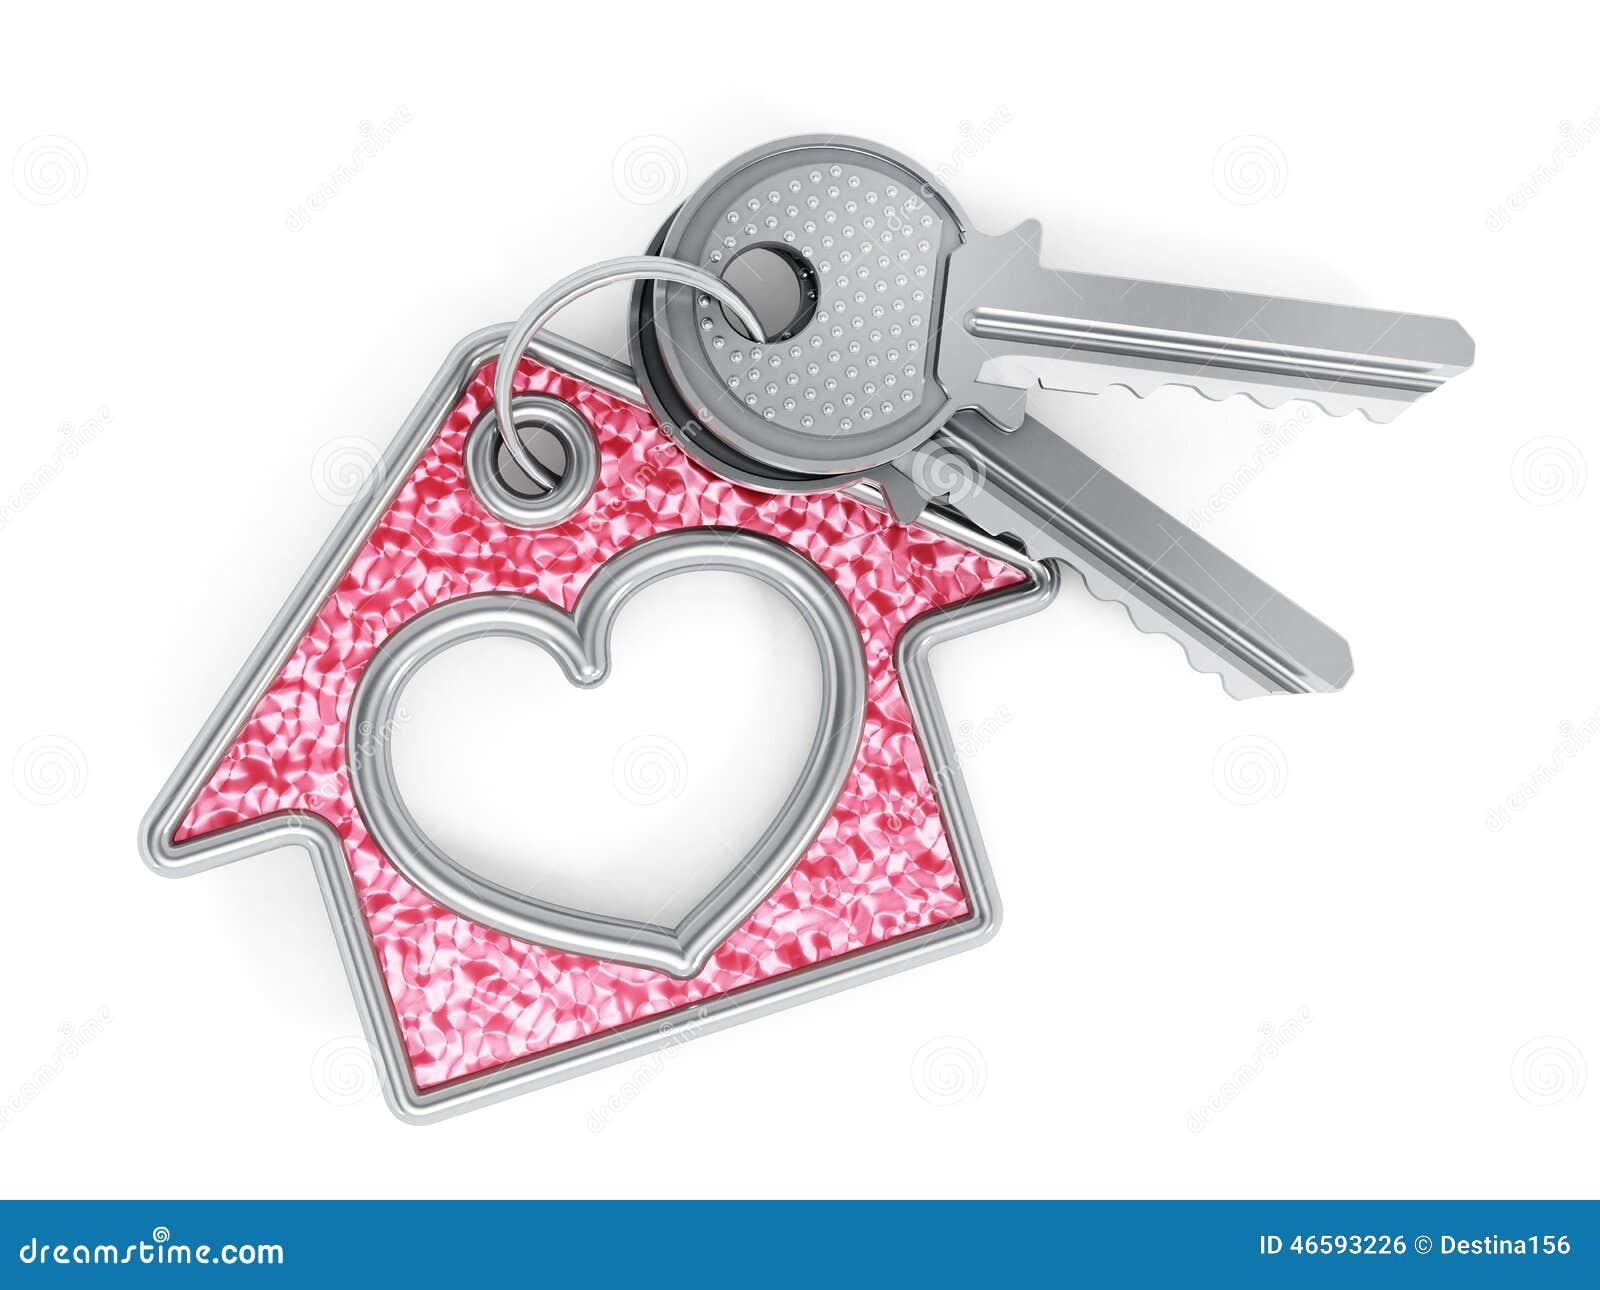 Keys and house pendant